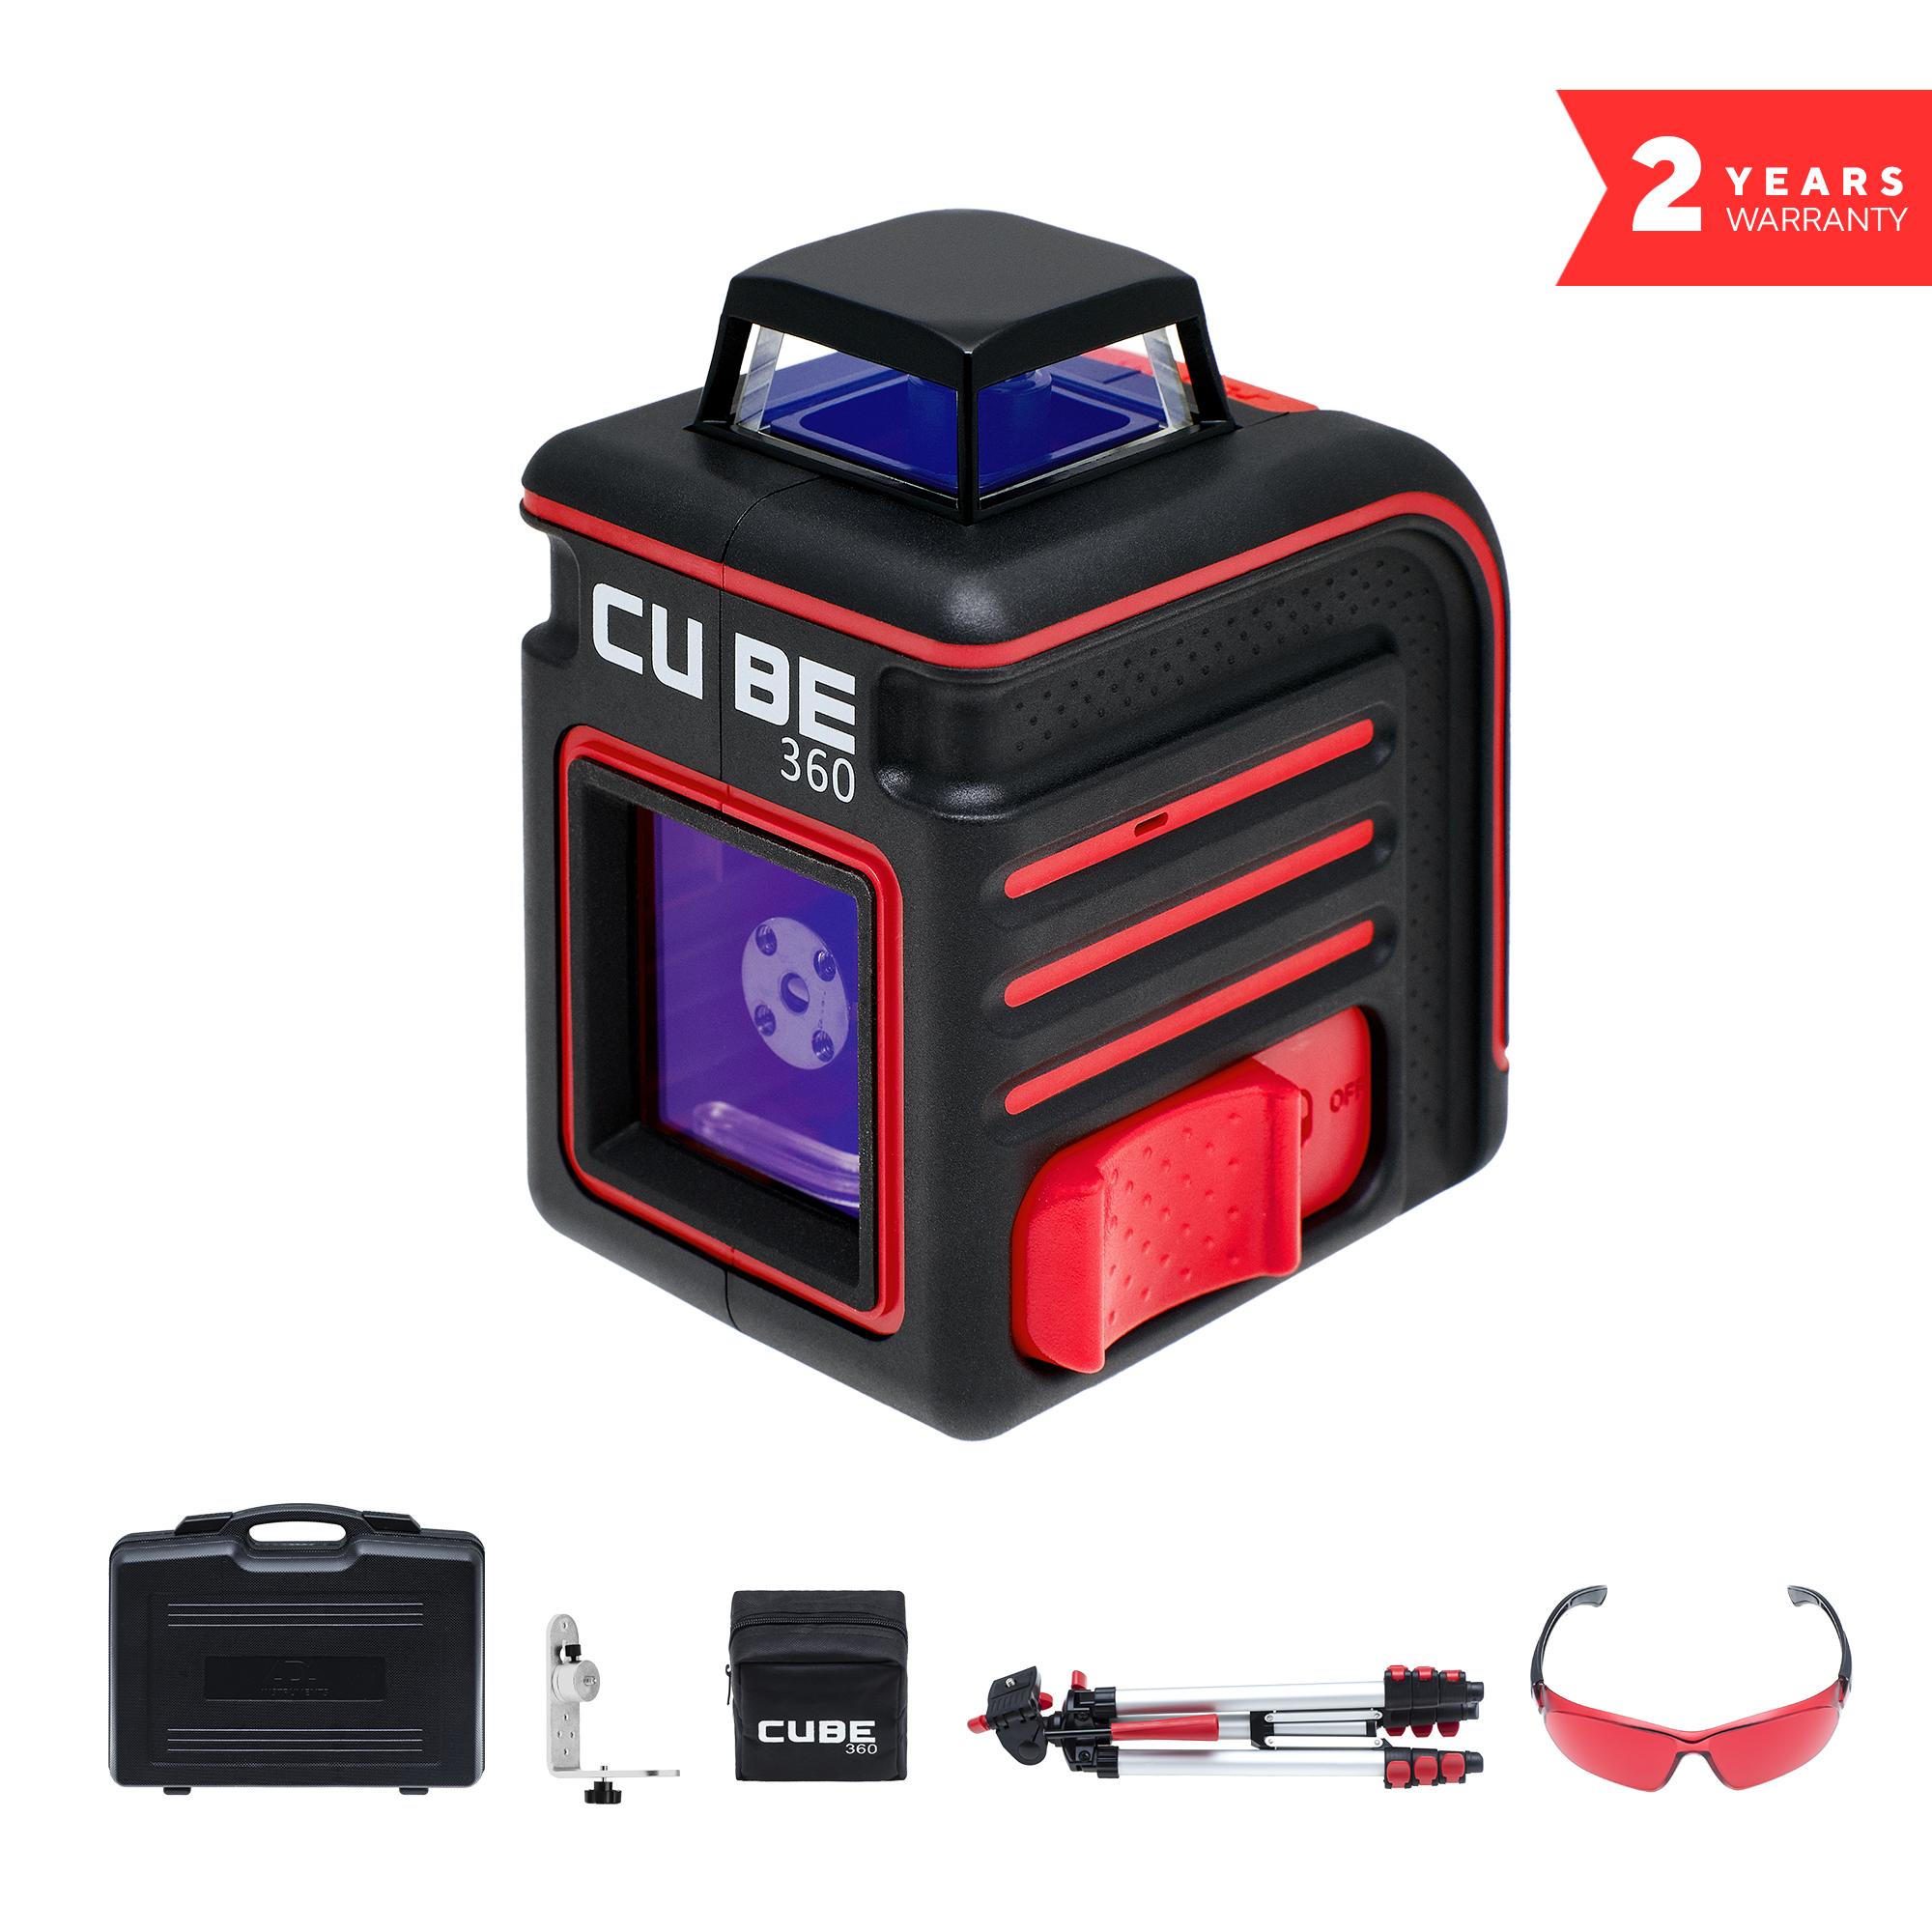 Laser Level ADA CUBE 360 ULTIMATE EDITION